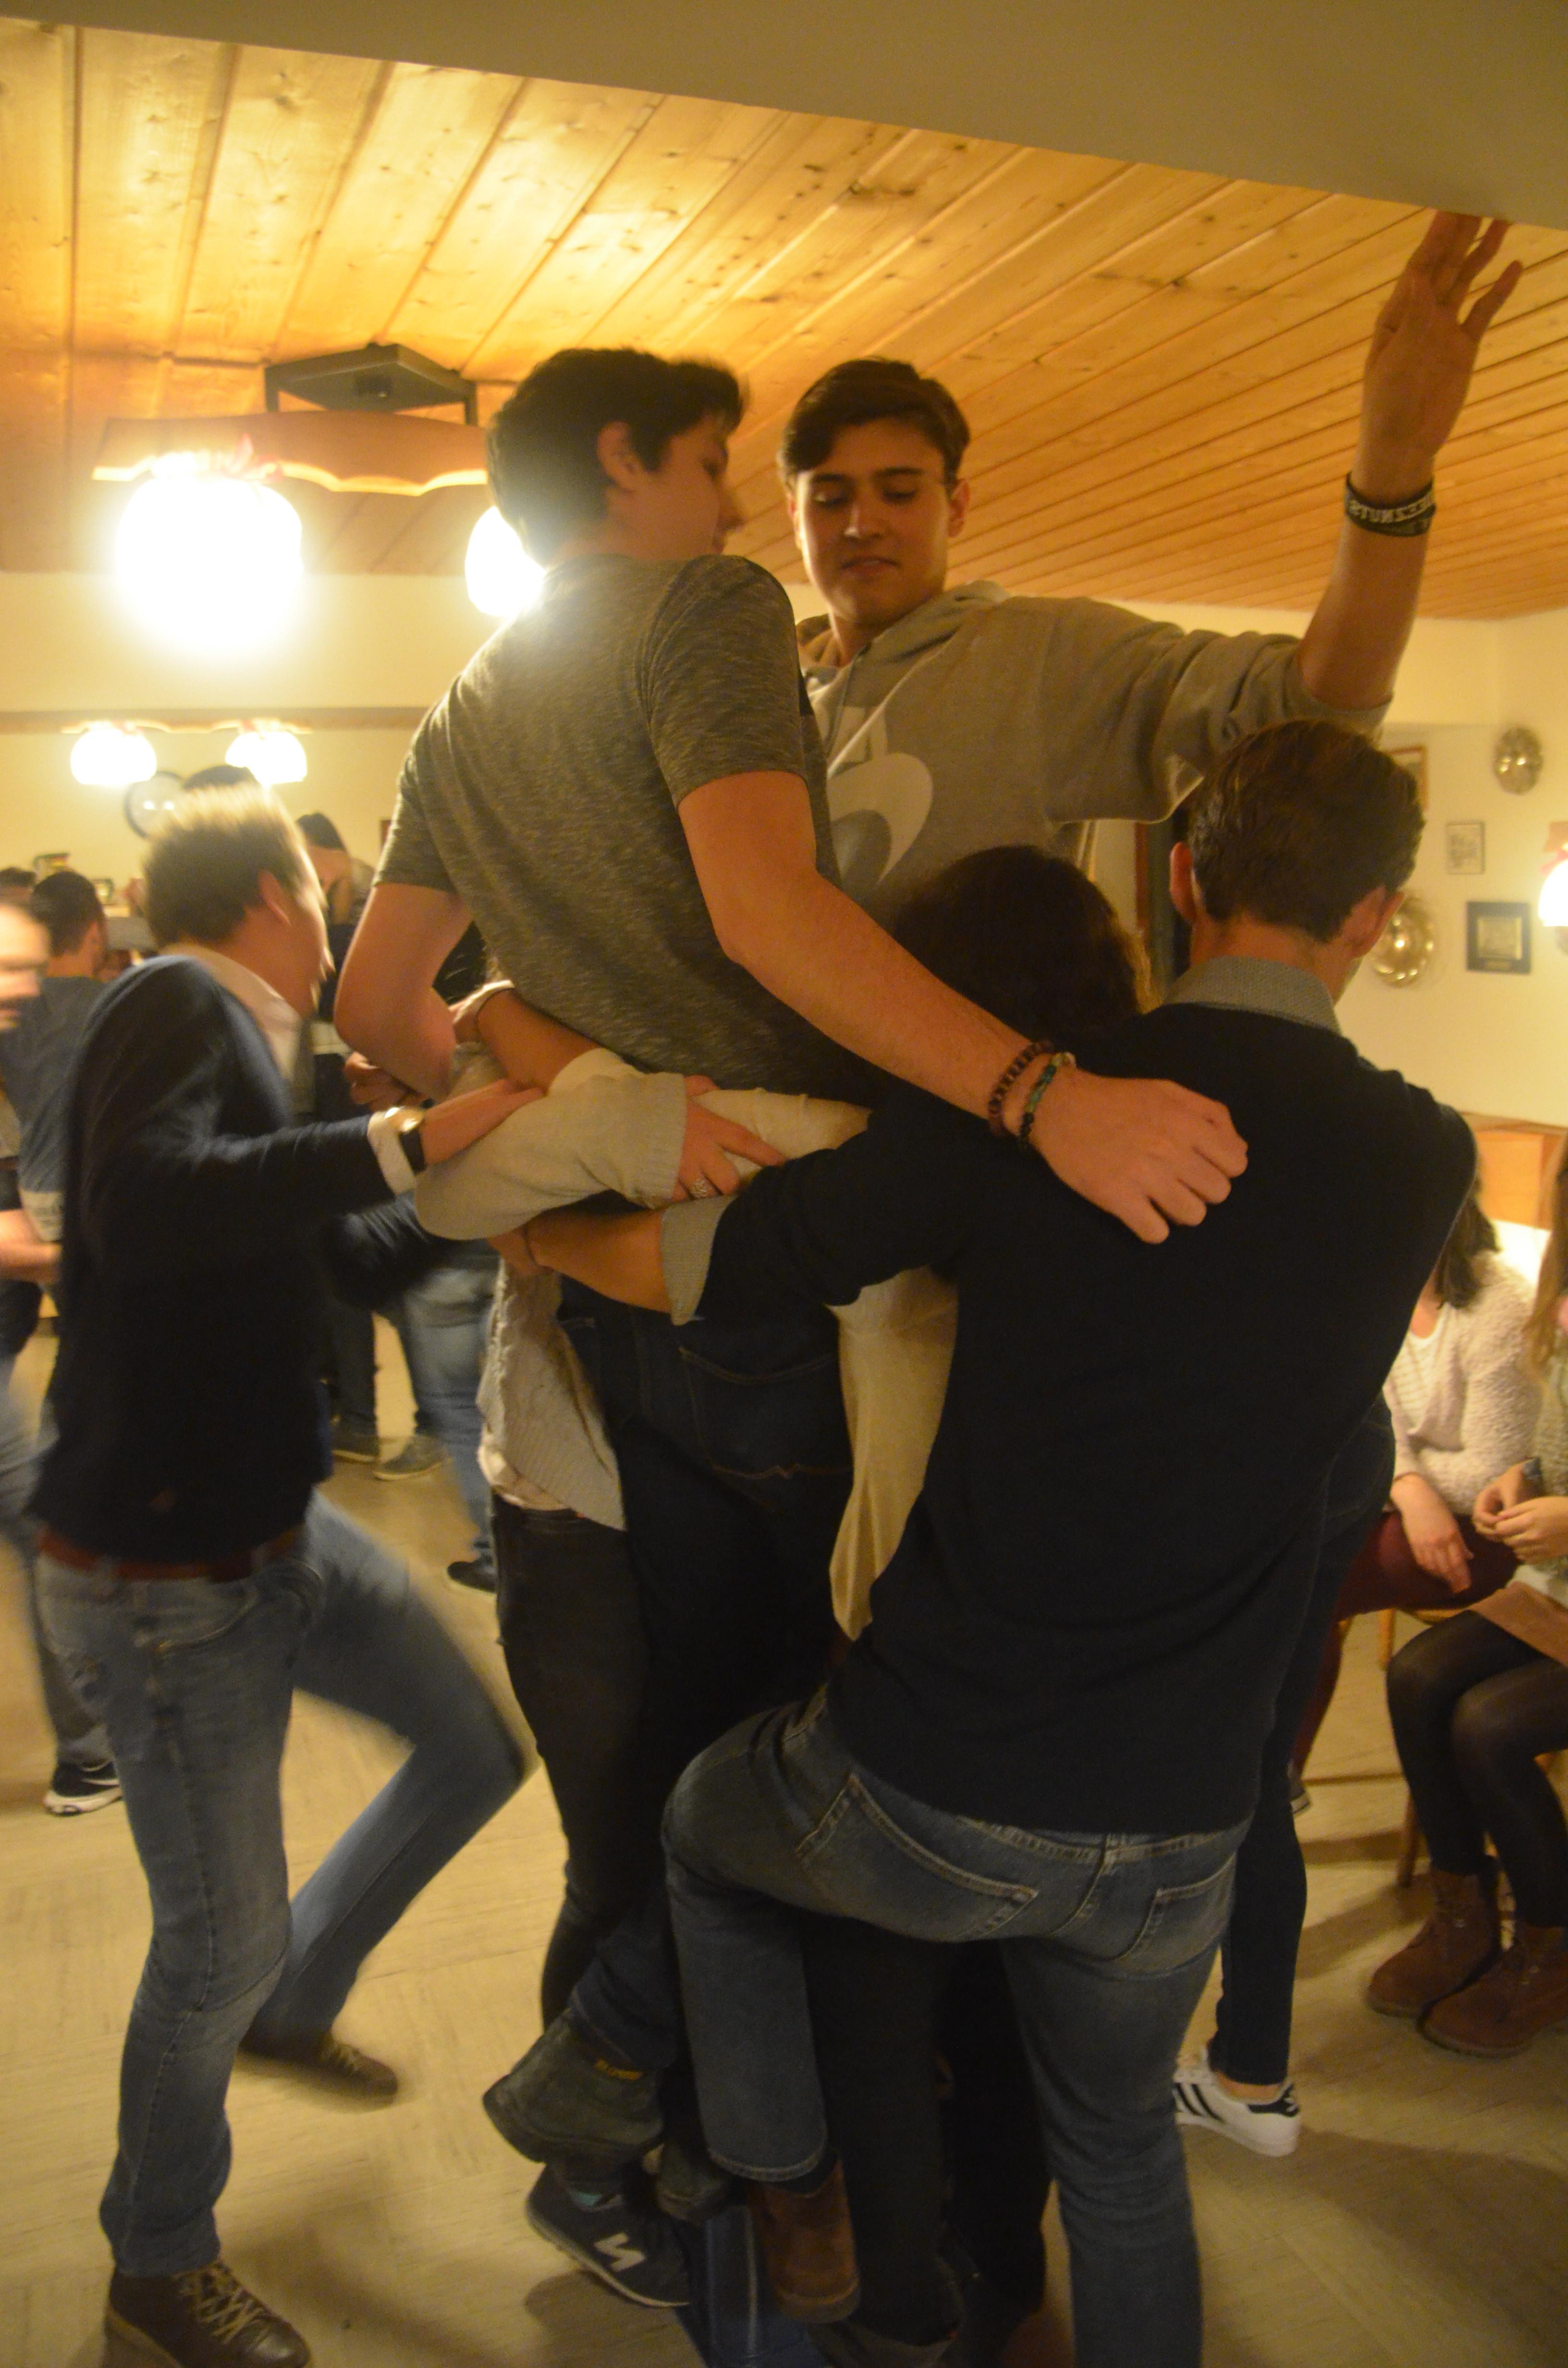 The Bavarian Olypmics